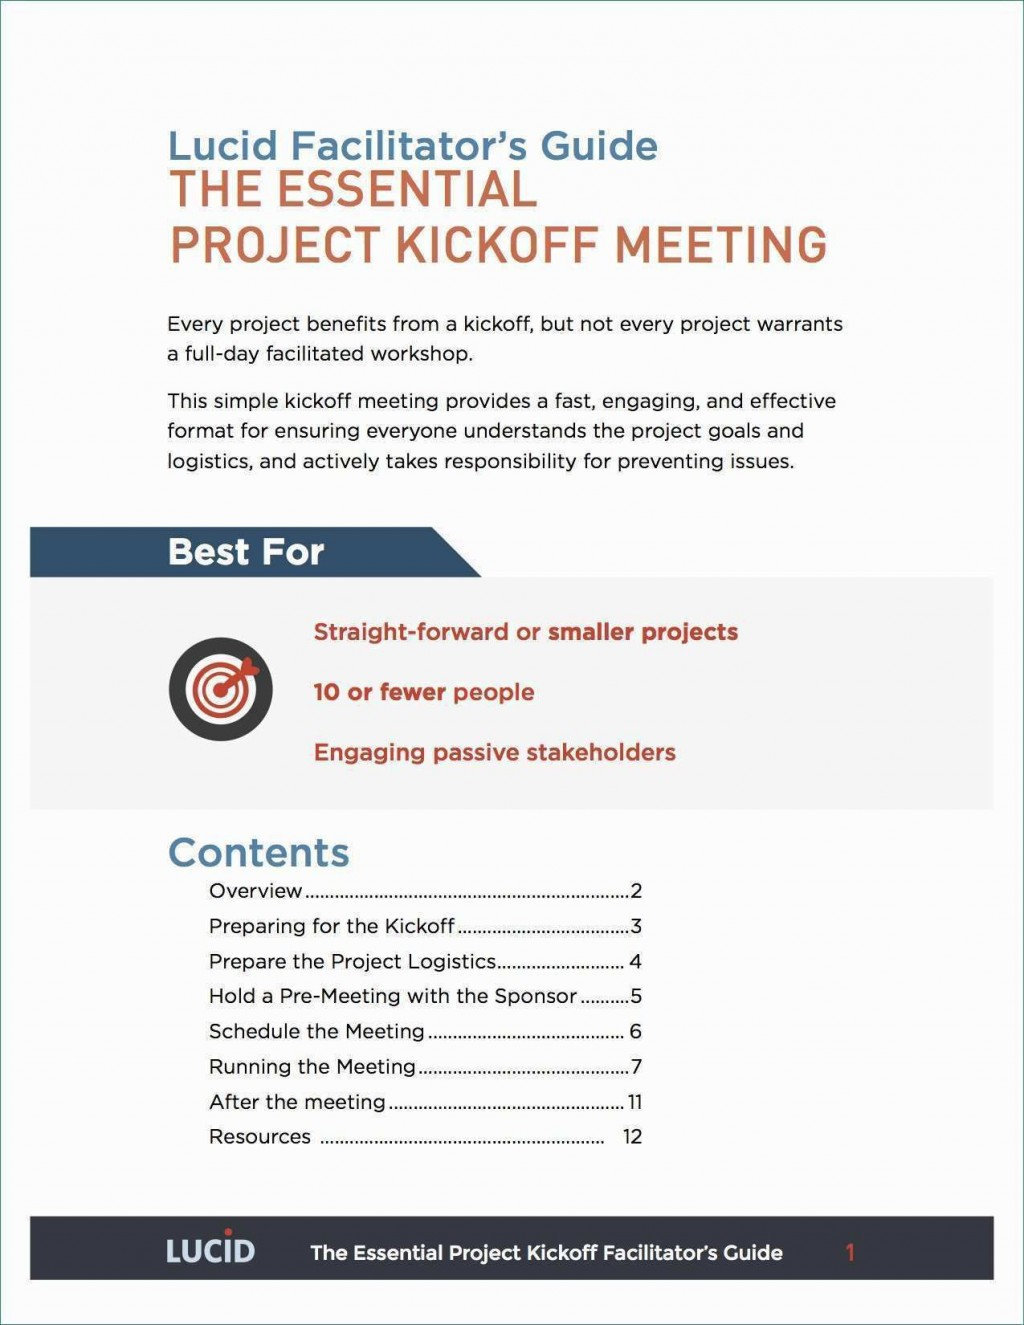 001 Surprising Project Kickoff Meeting Agenda Template Sample  ManagementLarge